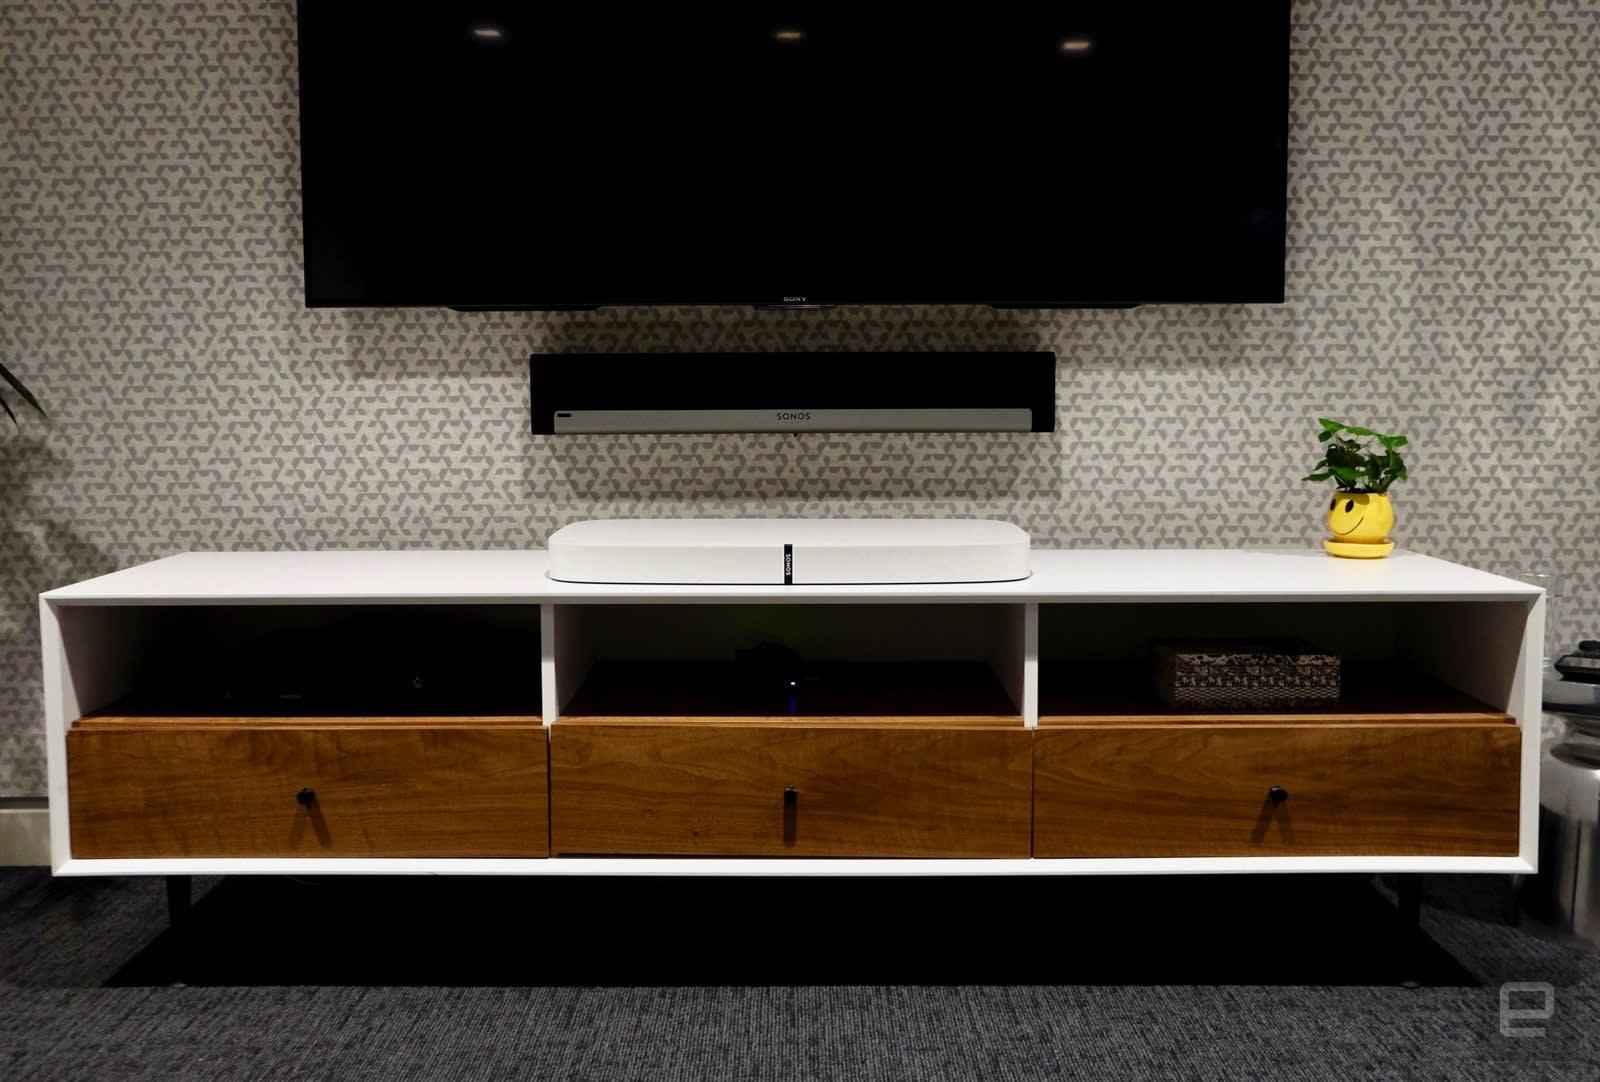 Sonos PlayBar and PlayBase